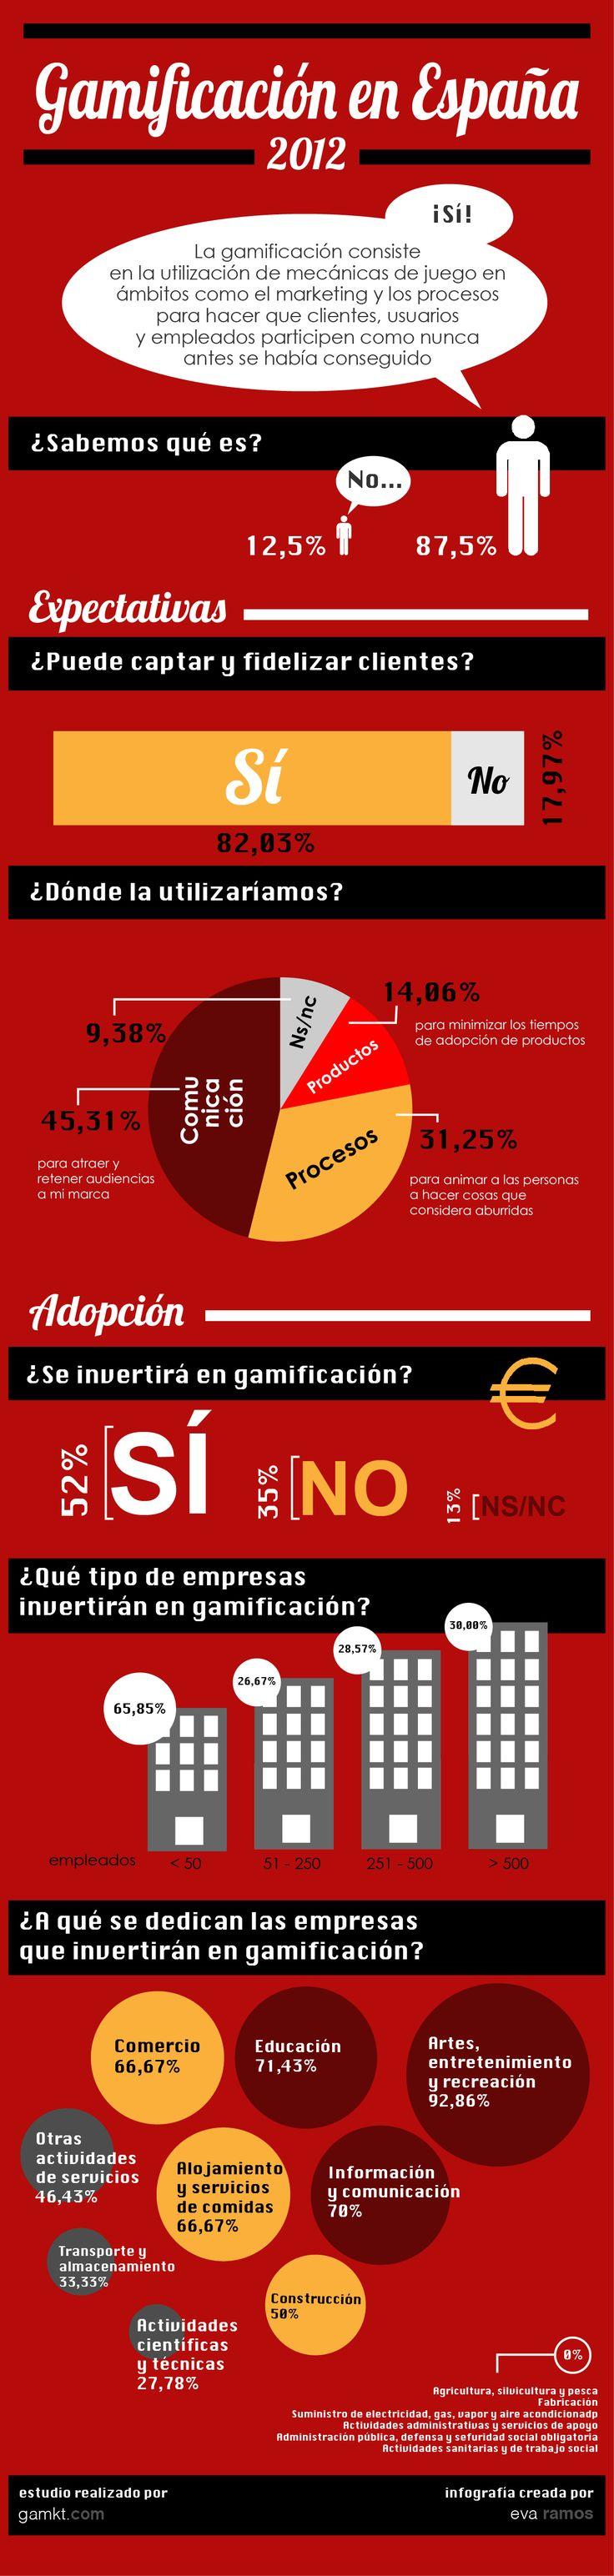 estudio-2012-gamificacion-spanish-version.png (1196×5021)